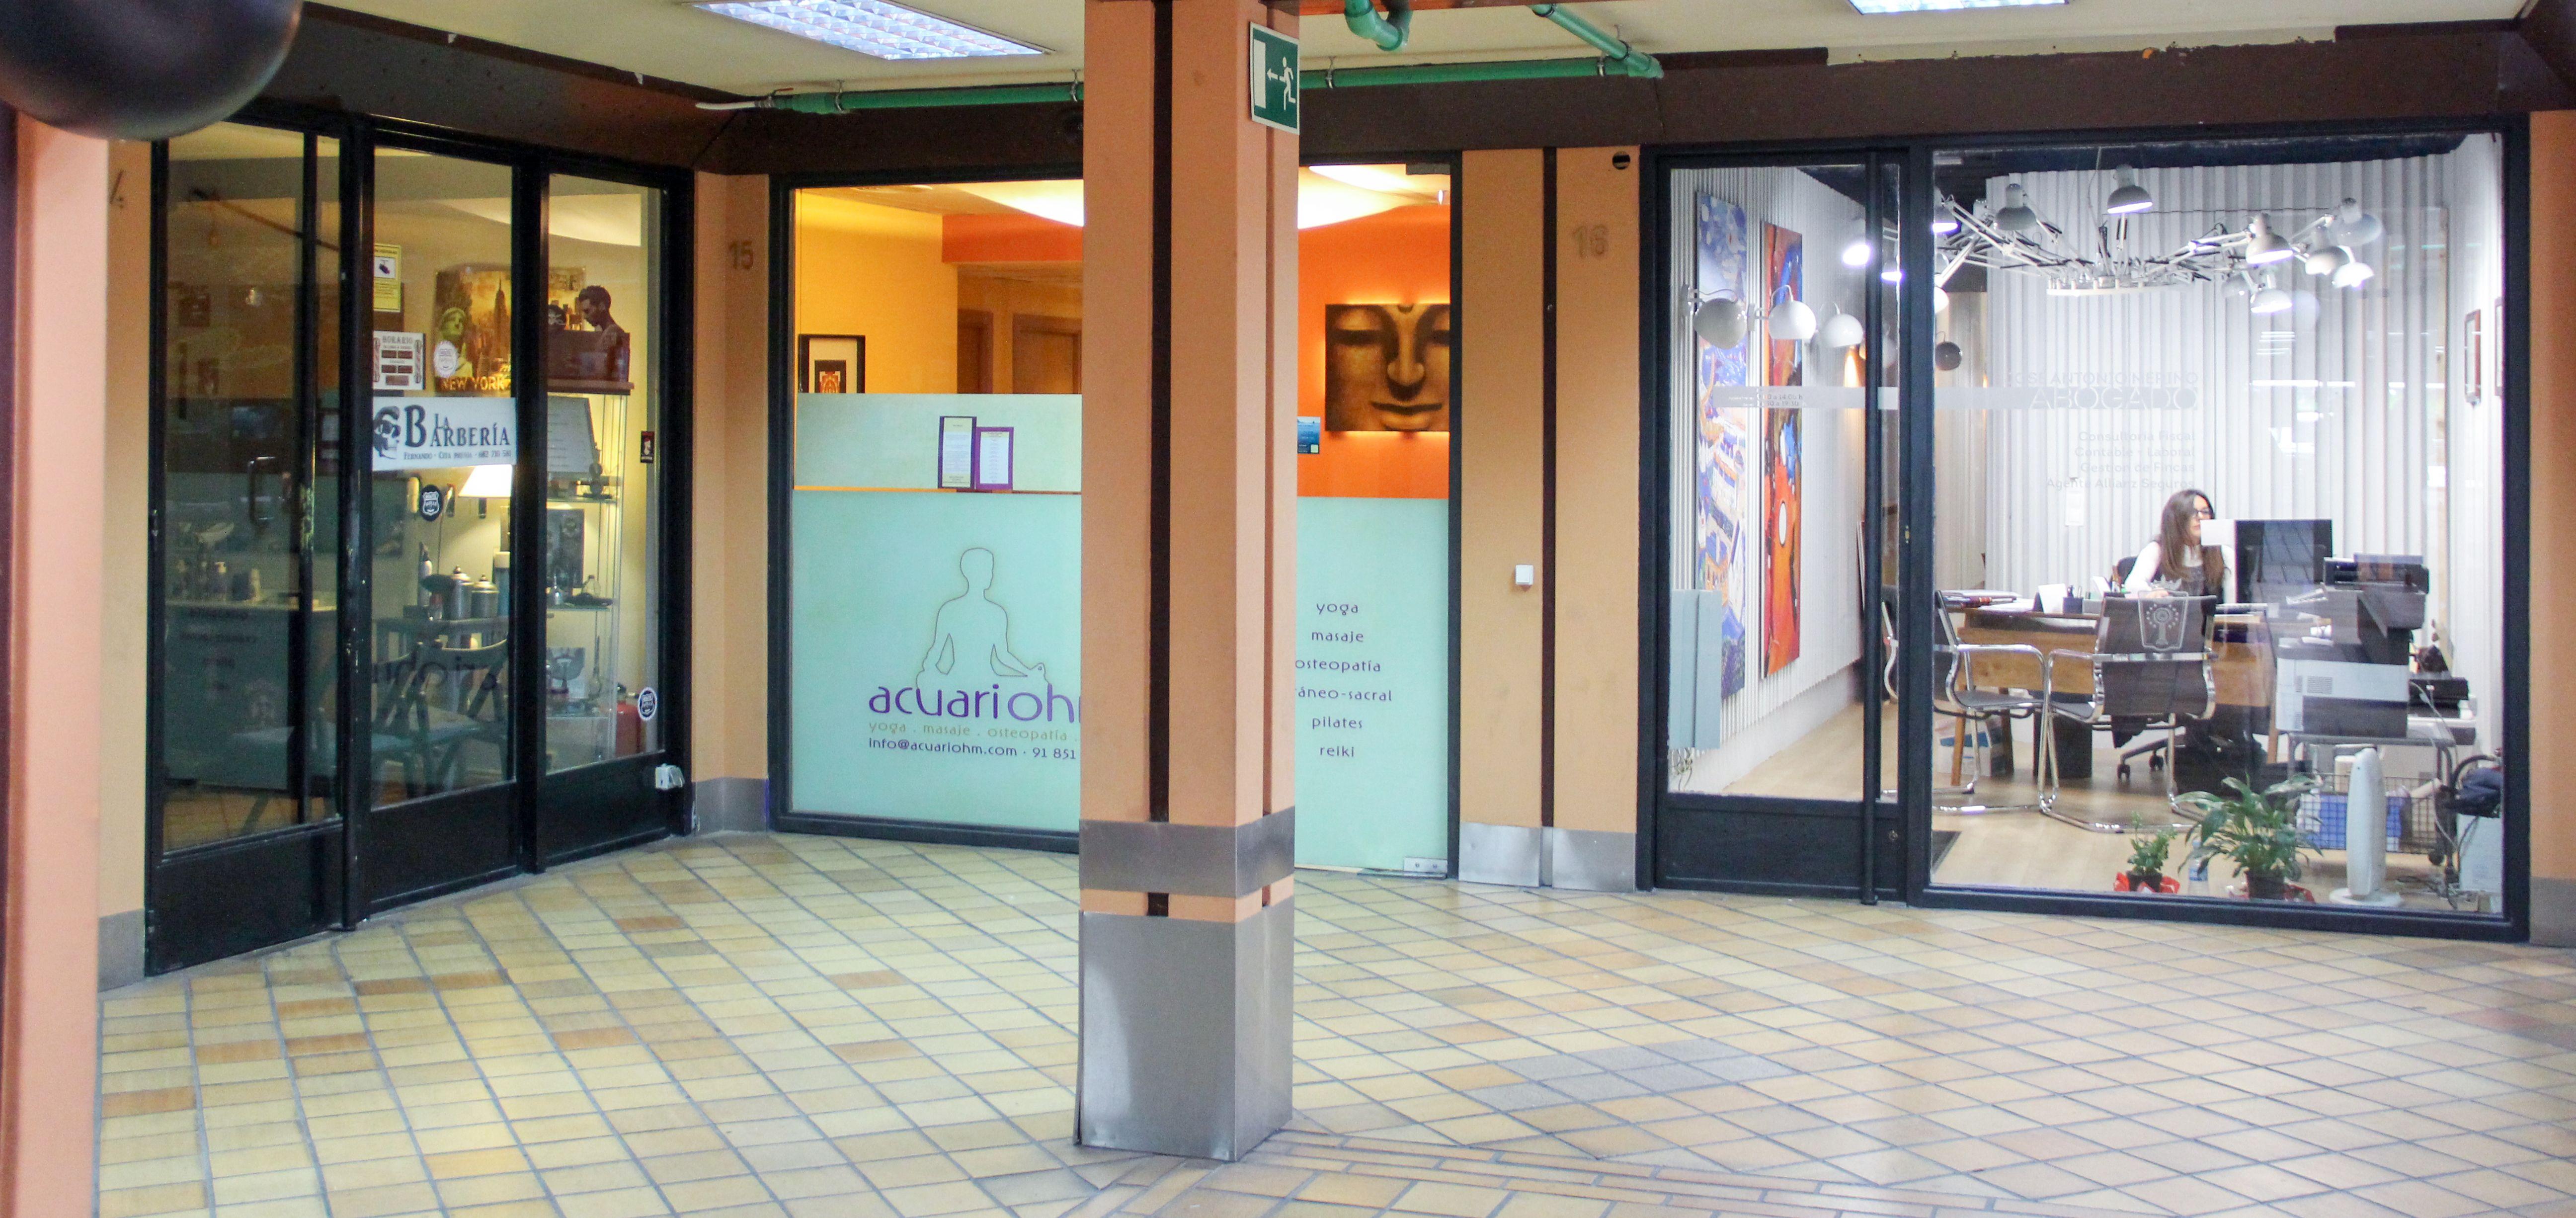 Horario del centro comercial lunes a domingo de 09:00 a 00:00 horas